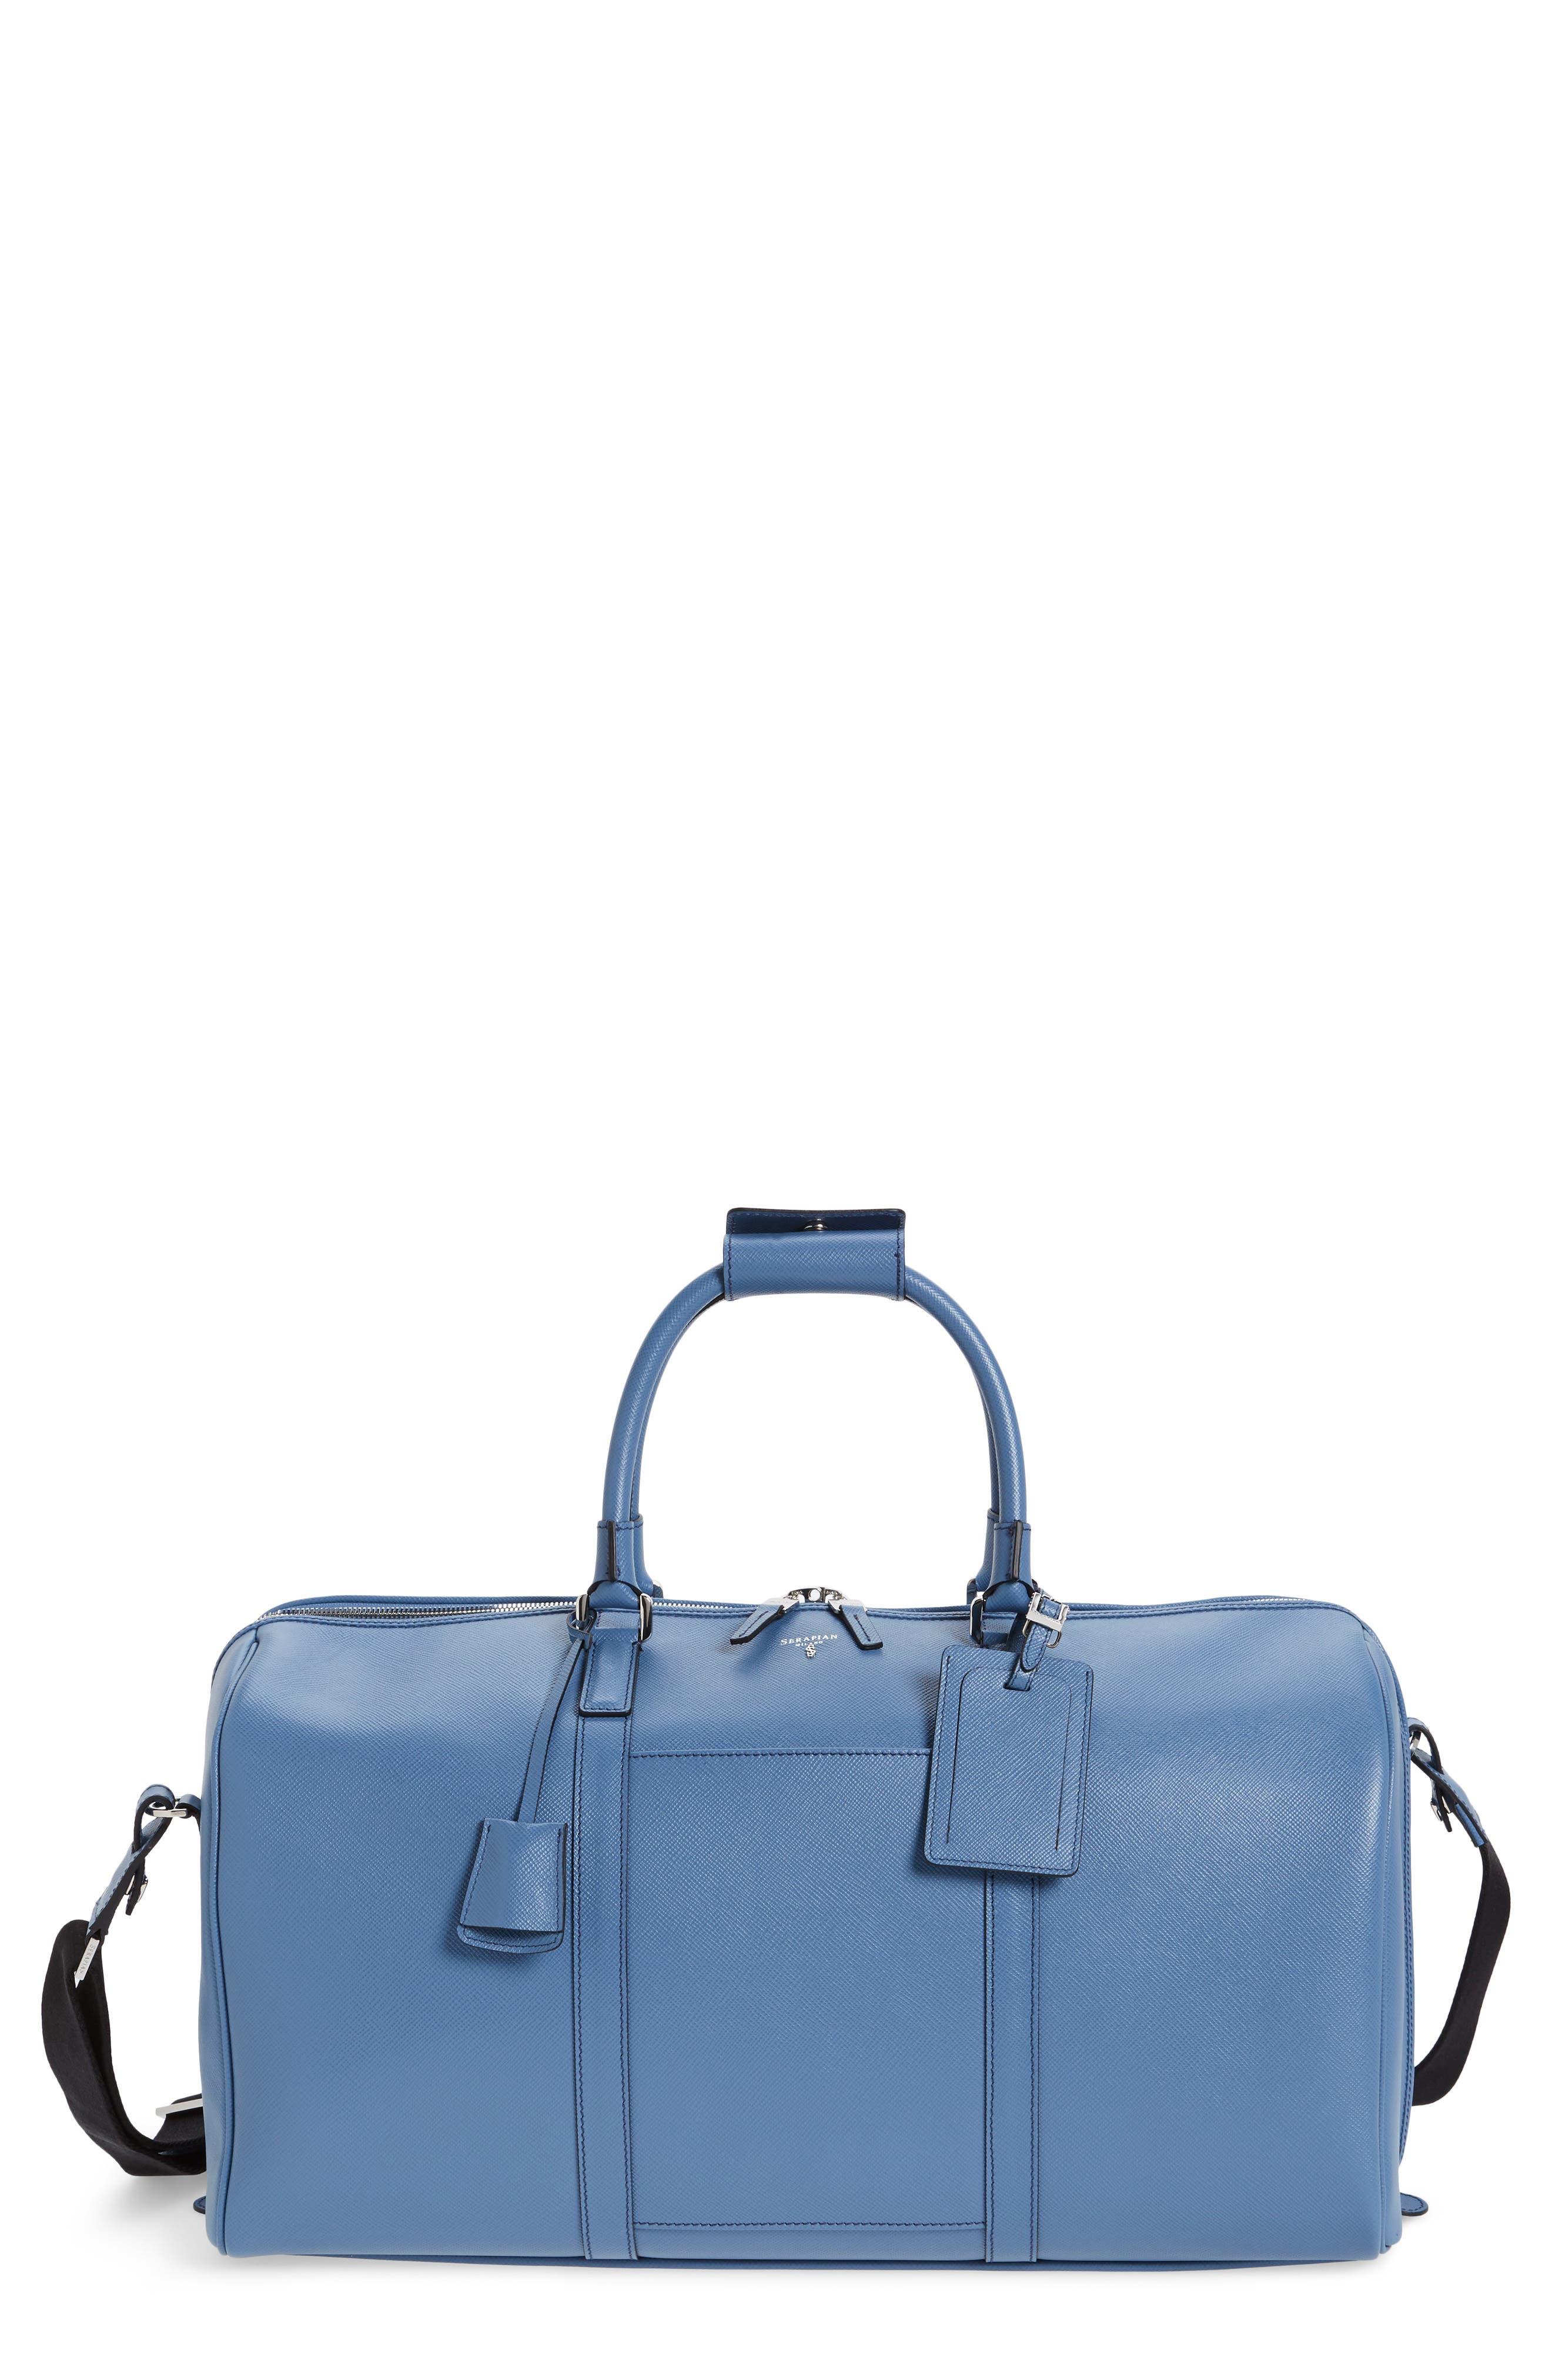 Alternate Image 1 Selected - Serapian Milano Small Evolution Leather Duffel Bag